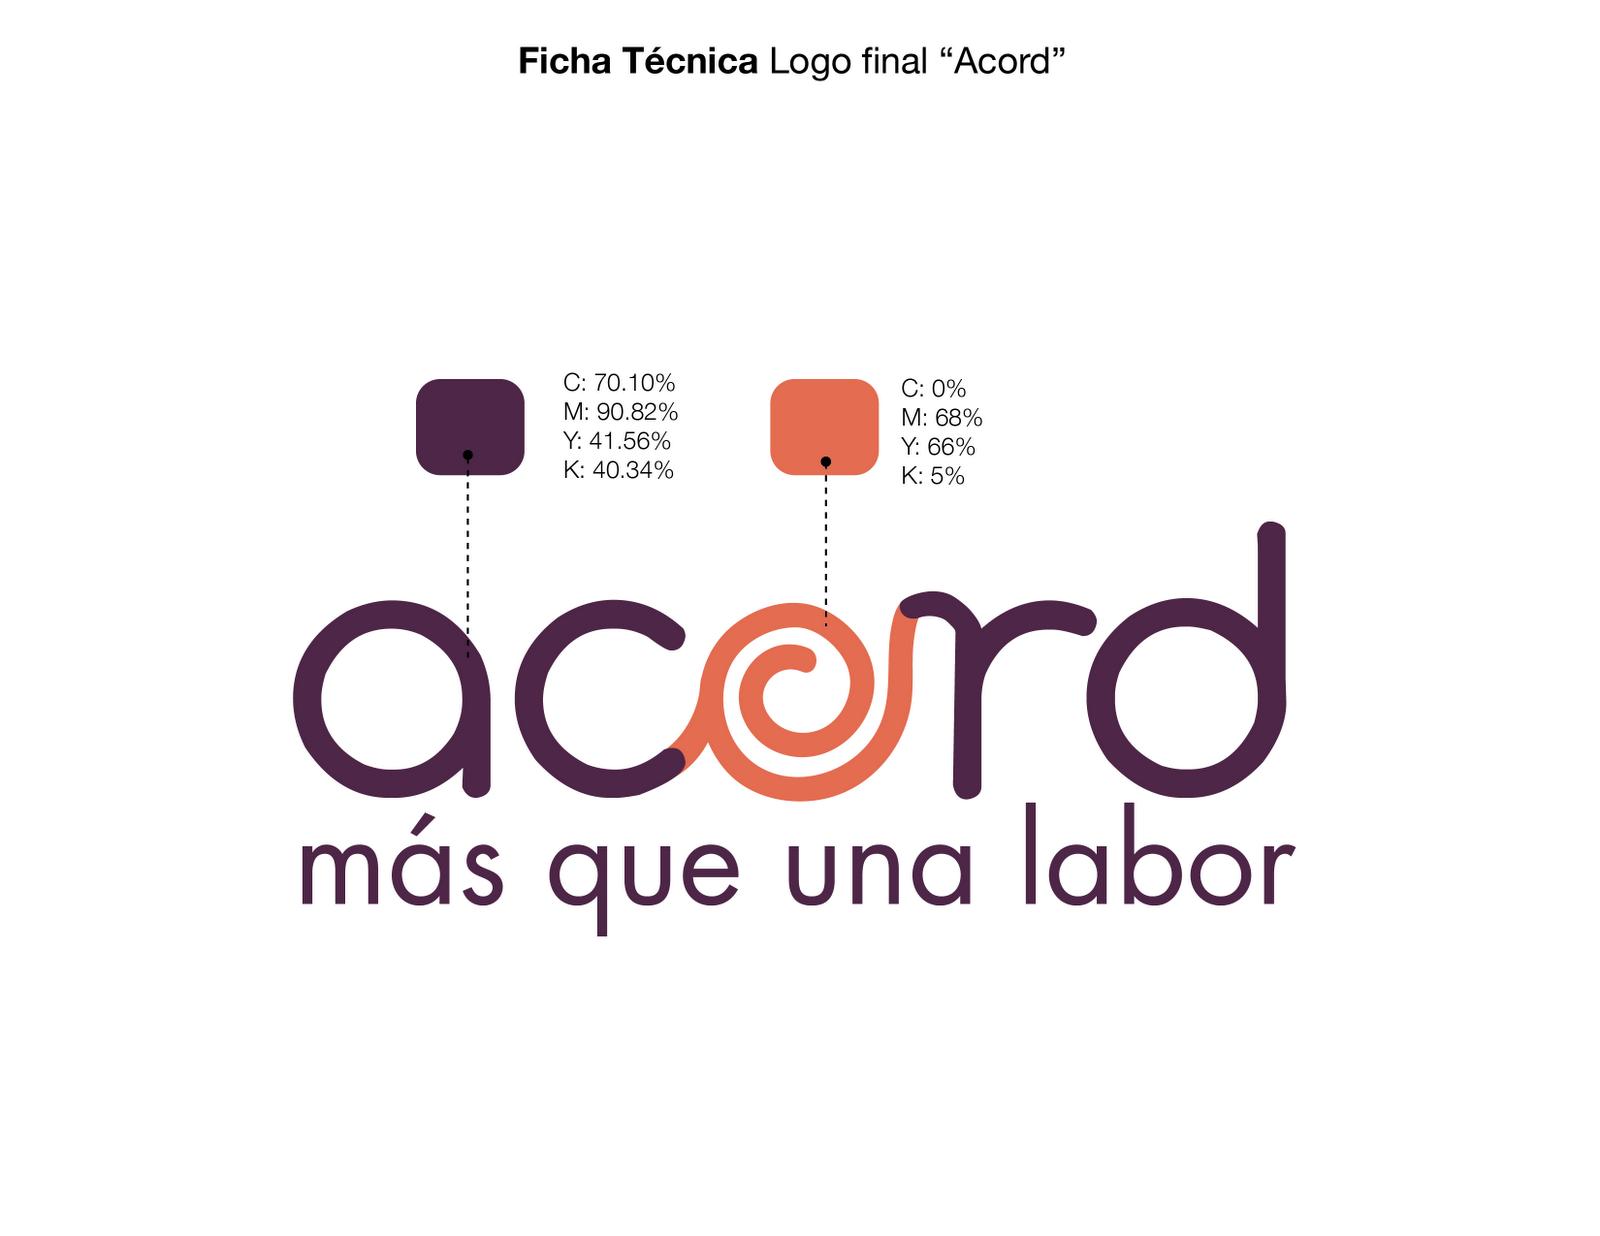 Diseno De Baños Para Tercera Edad:Diseño E4-Para la Tercera Edad: Ficha técnica Logo final: ACORD